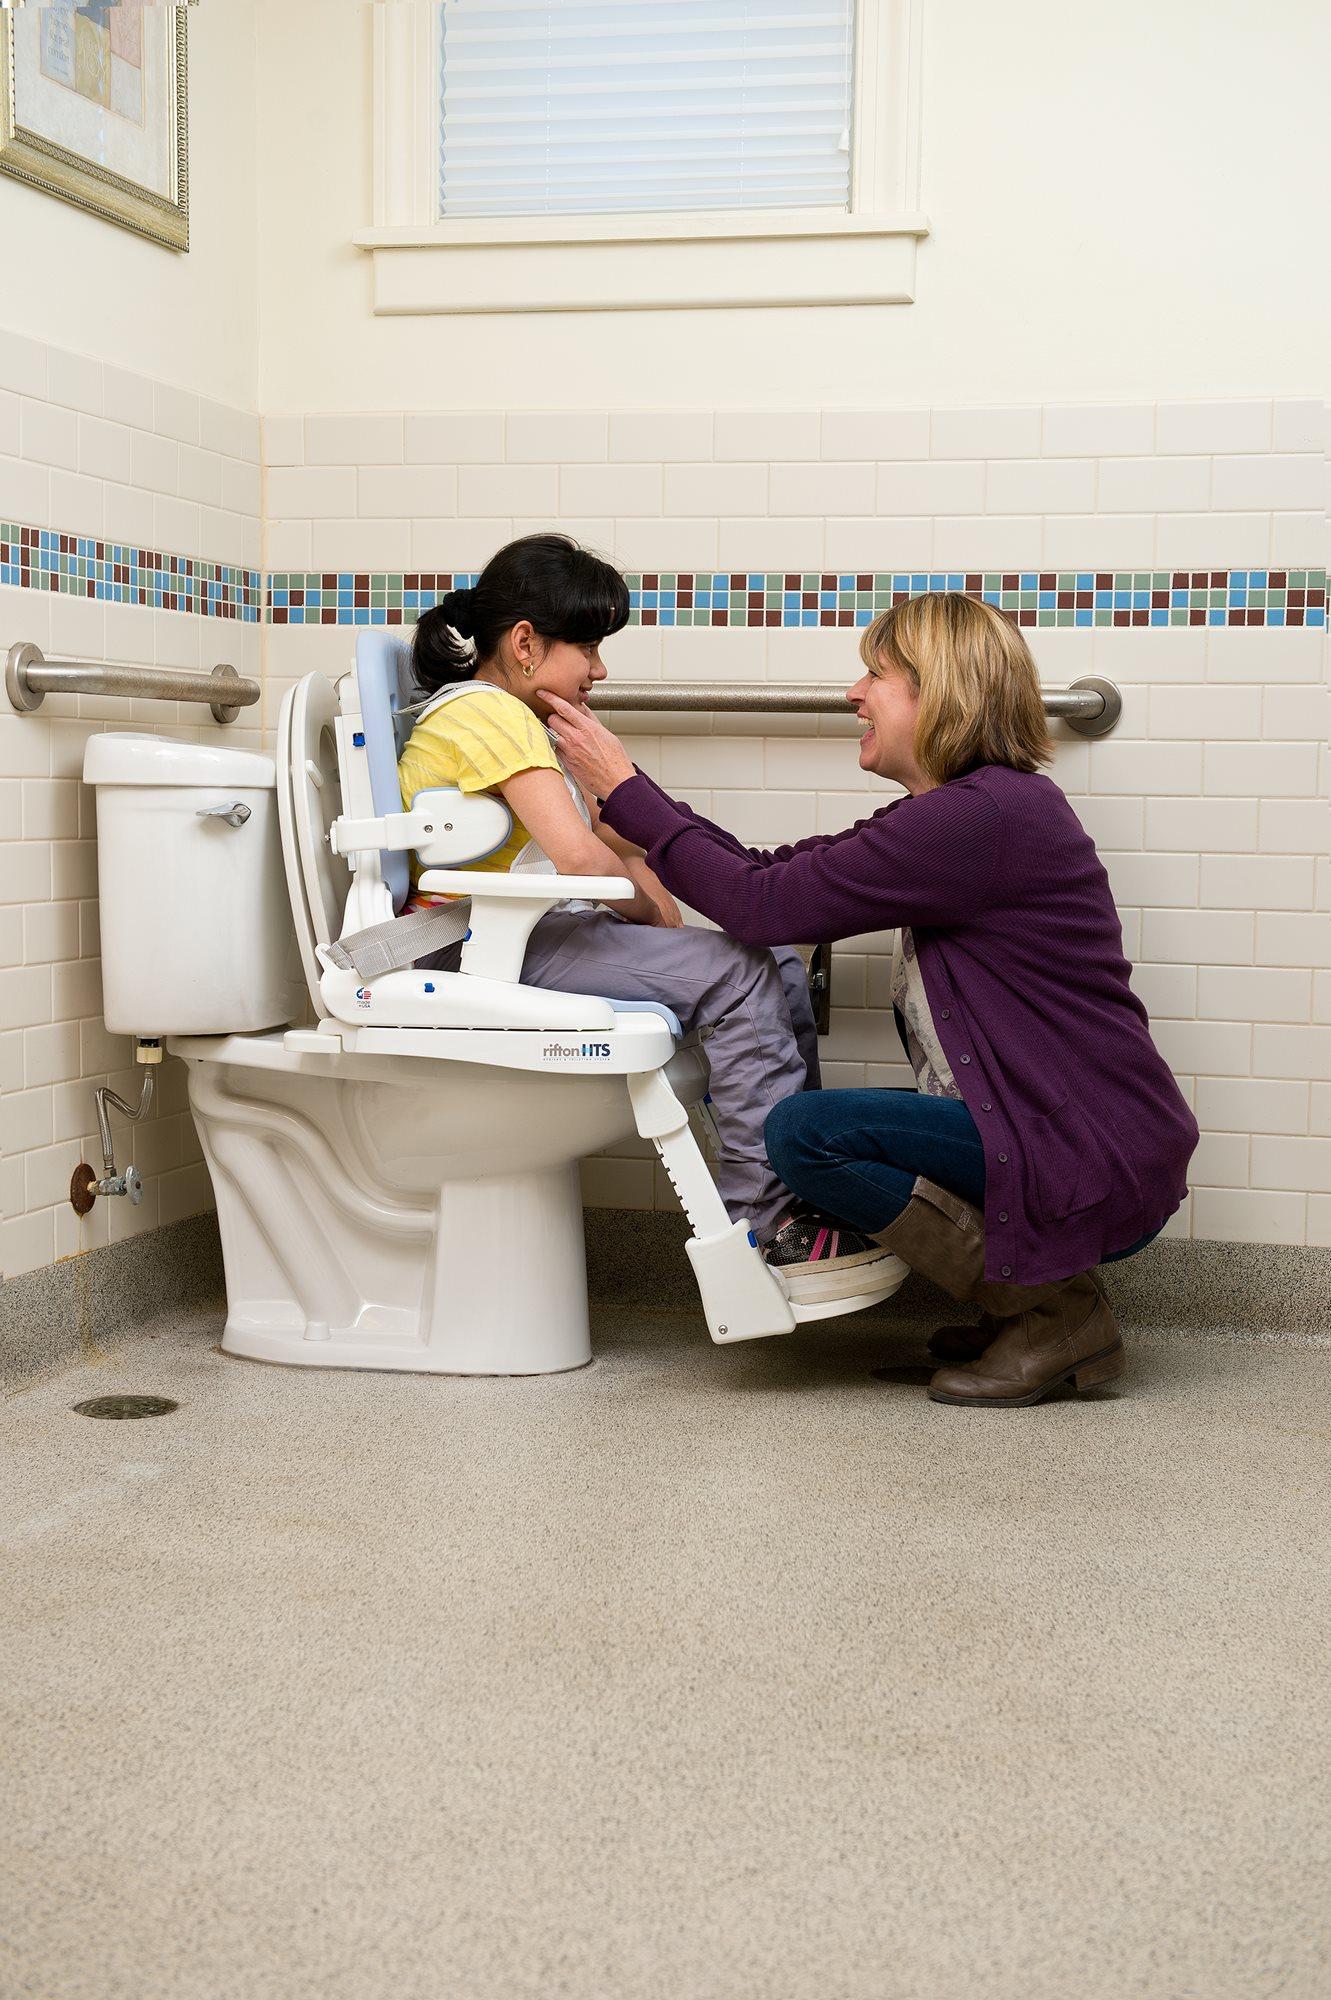 Rifton The Rifton Hts Hygiene Amp Toileting System